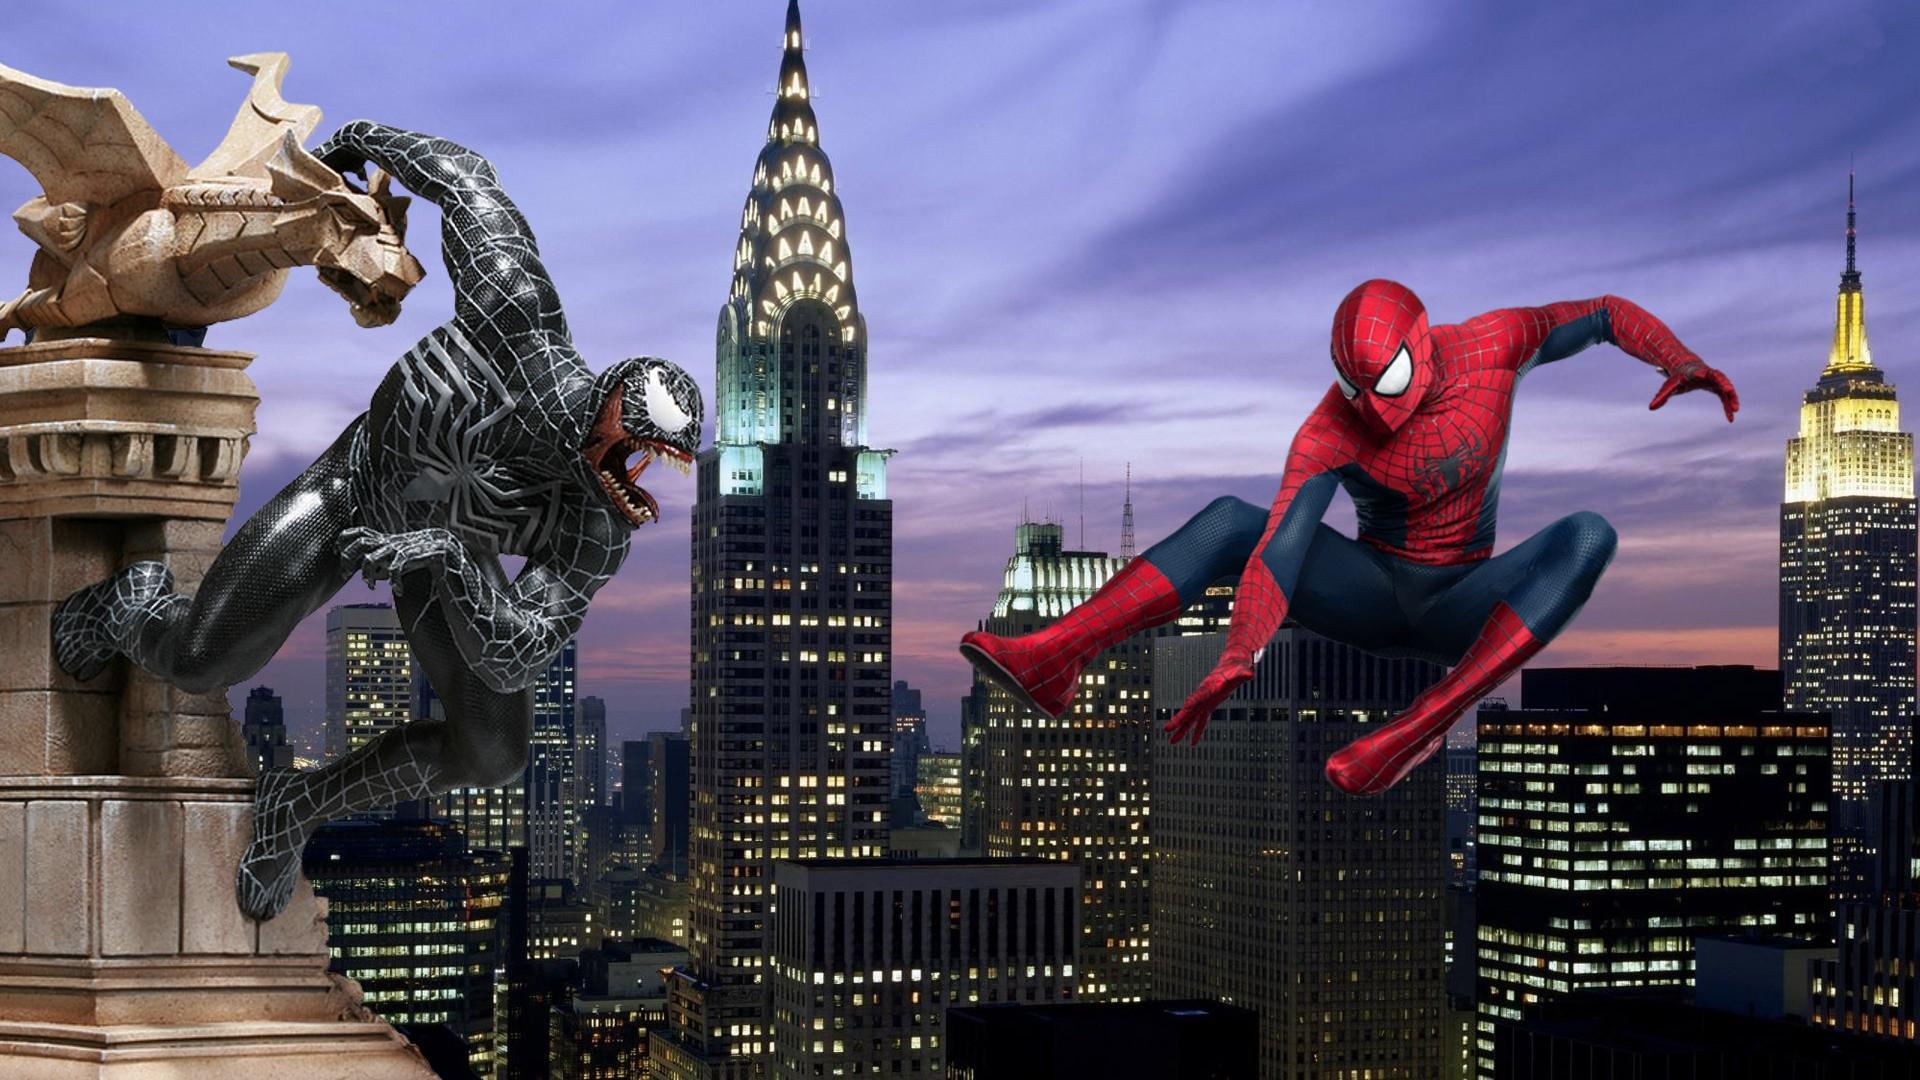 Spider-Man Vs. Venom by ProfessorAdagio on DeviantArt